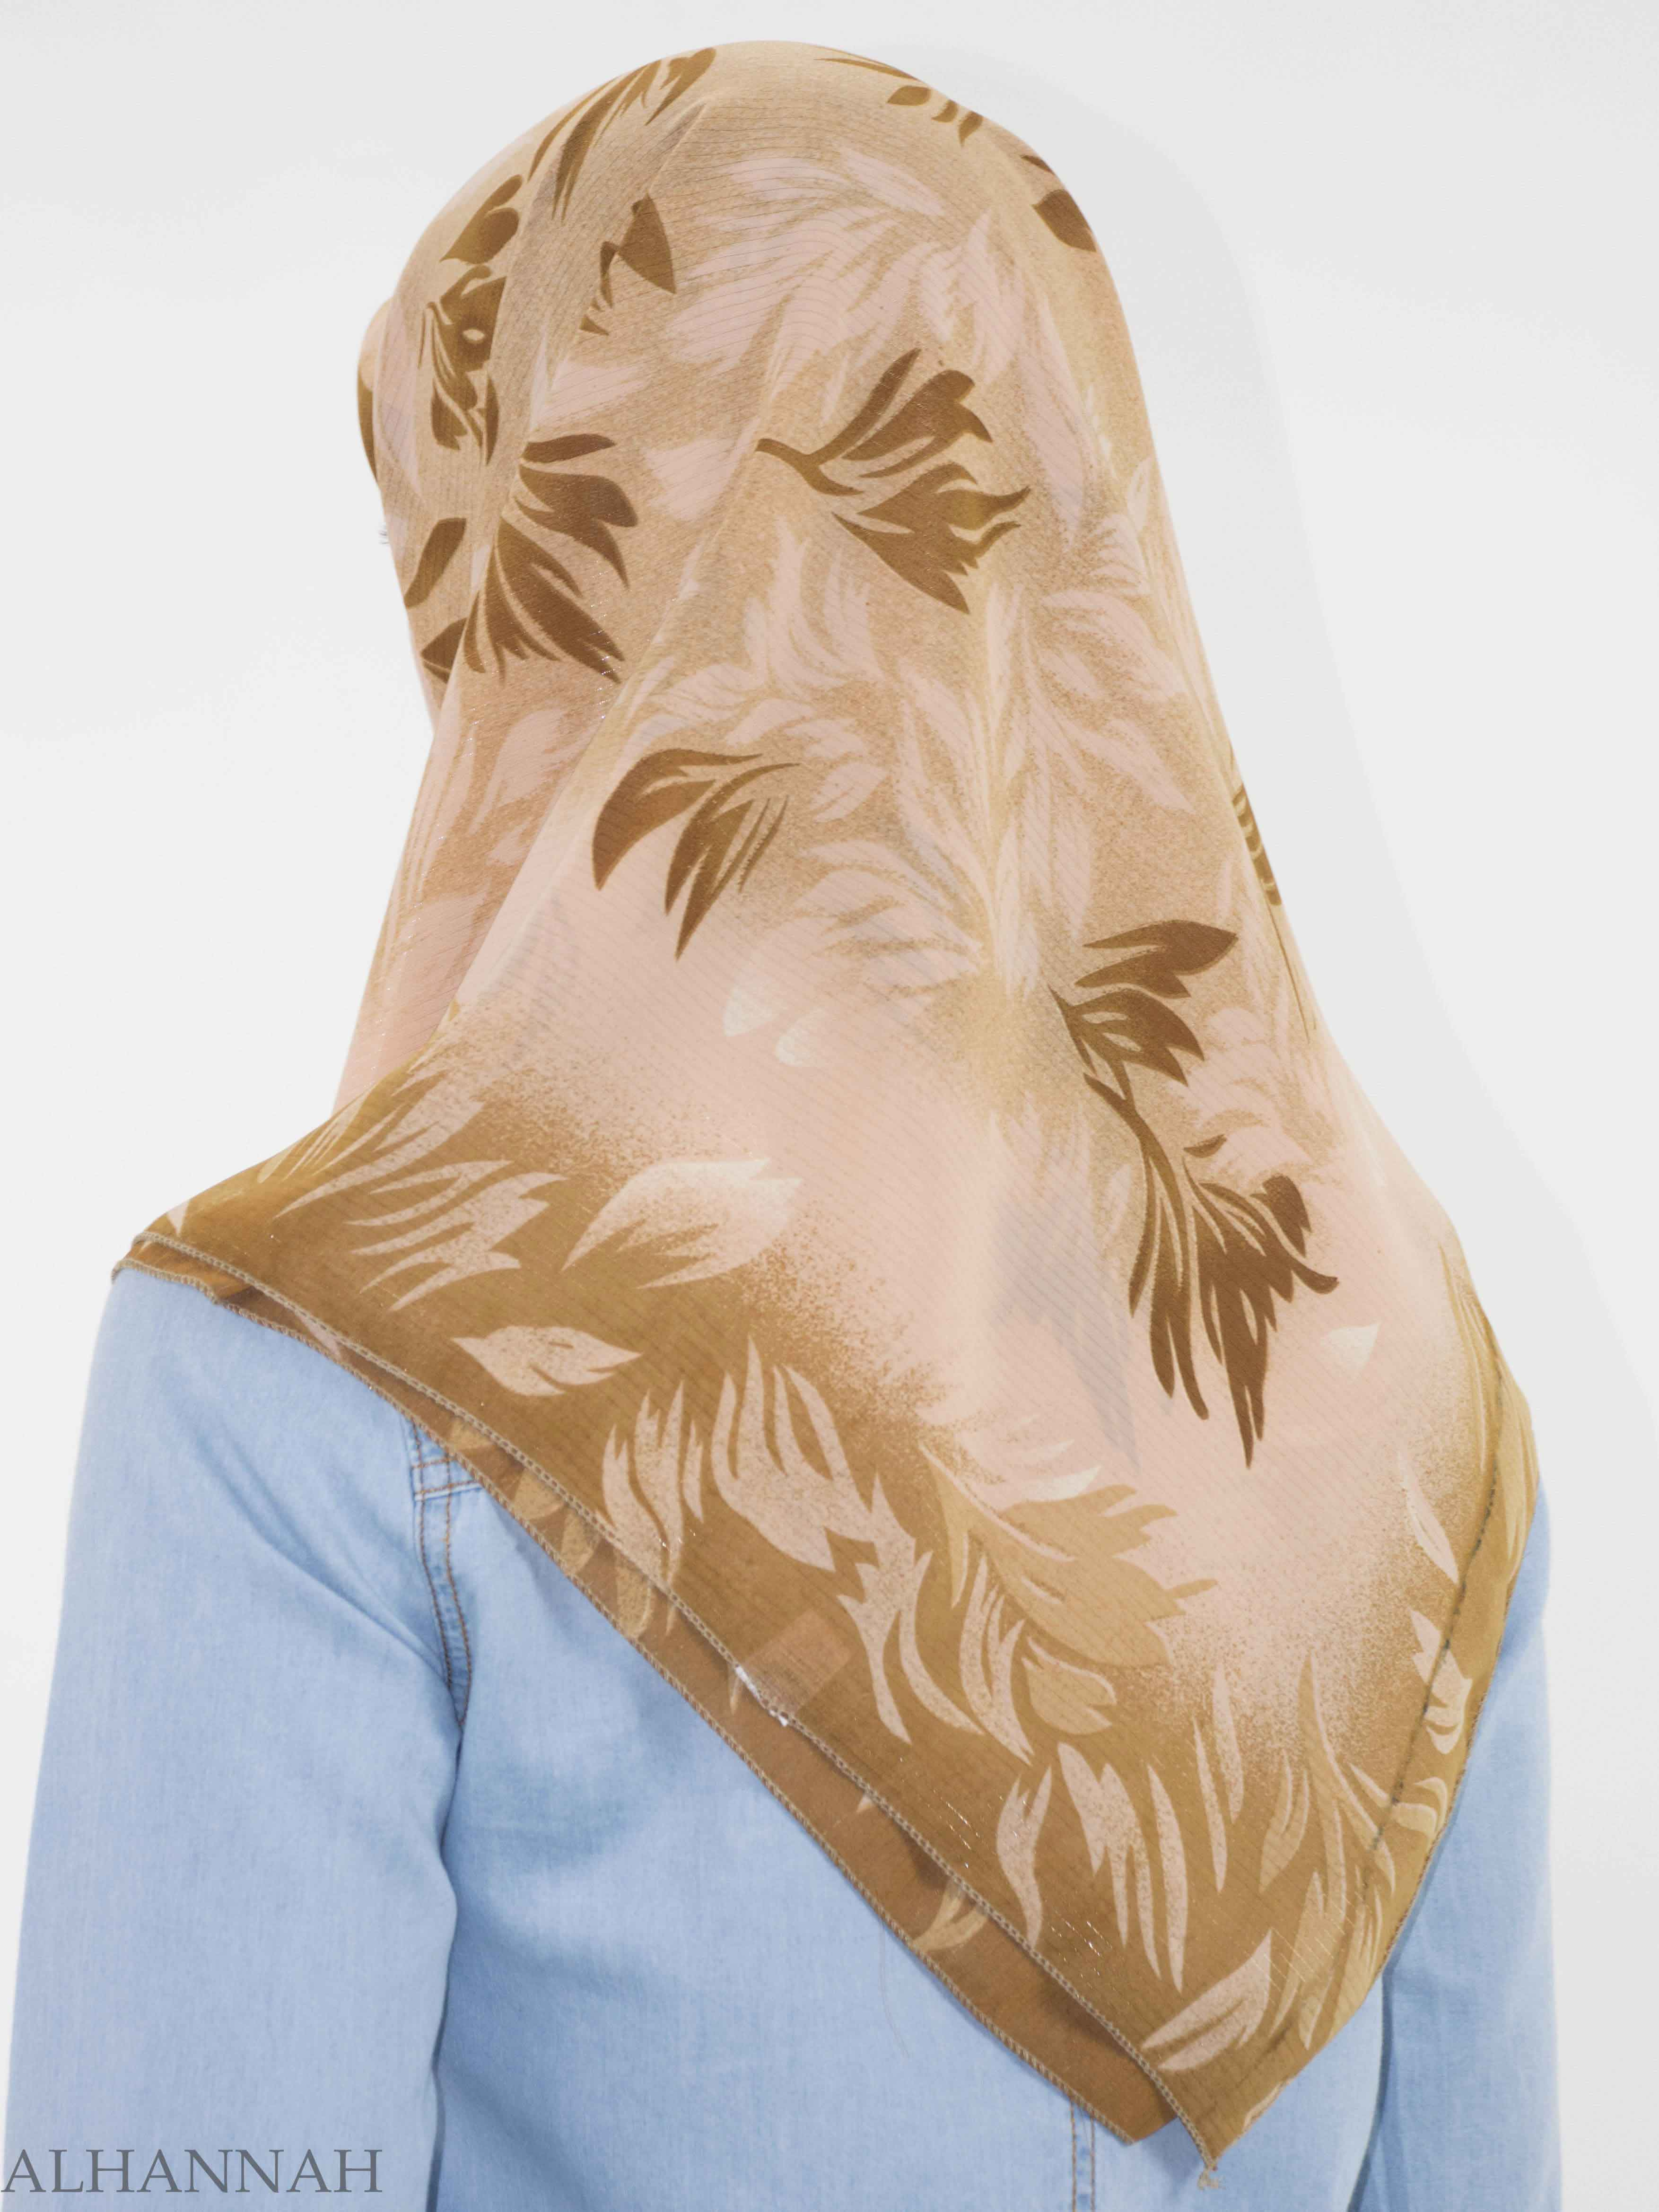 Branching Leaves Print Square Hijab HI2150 (3)